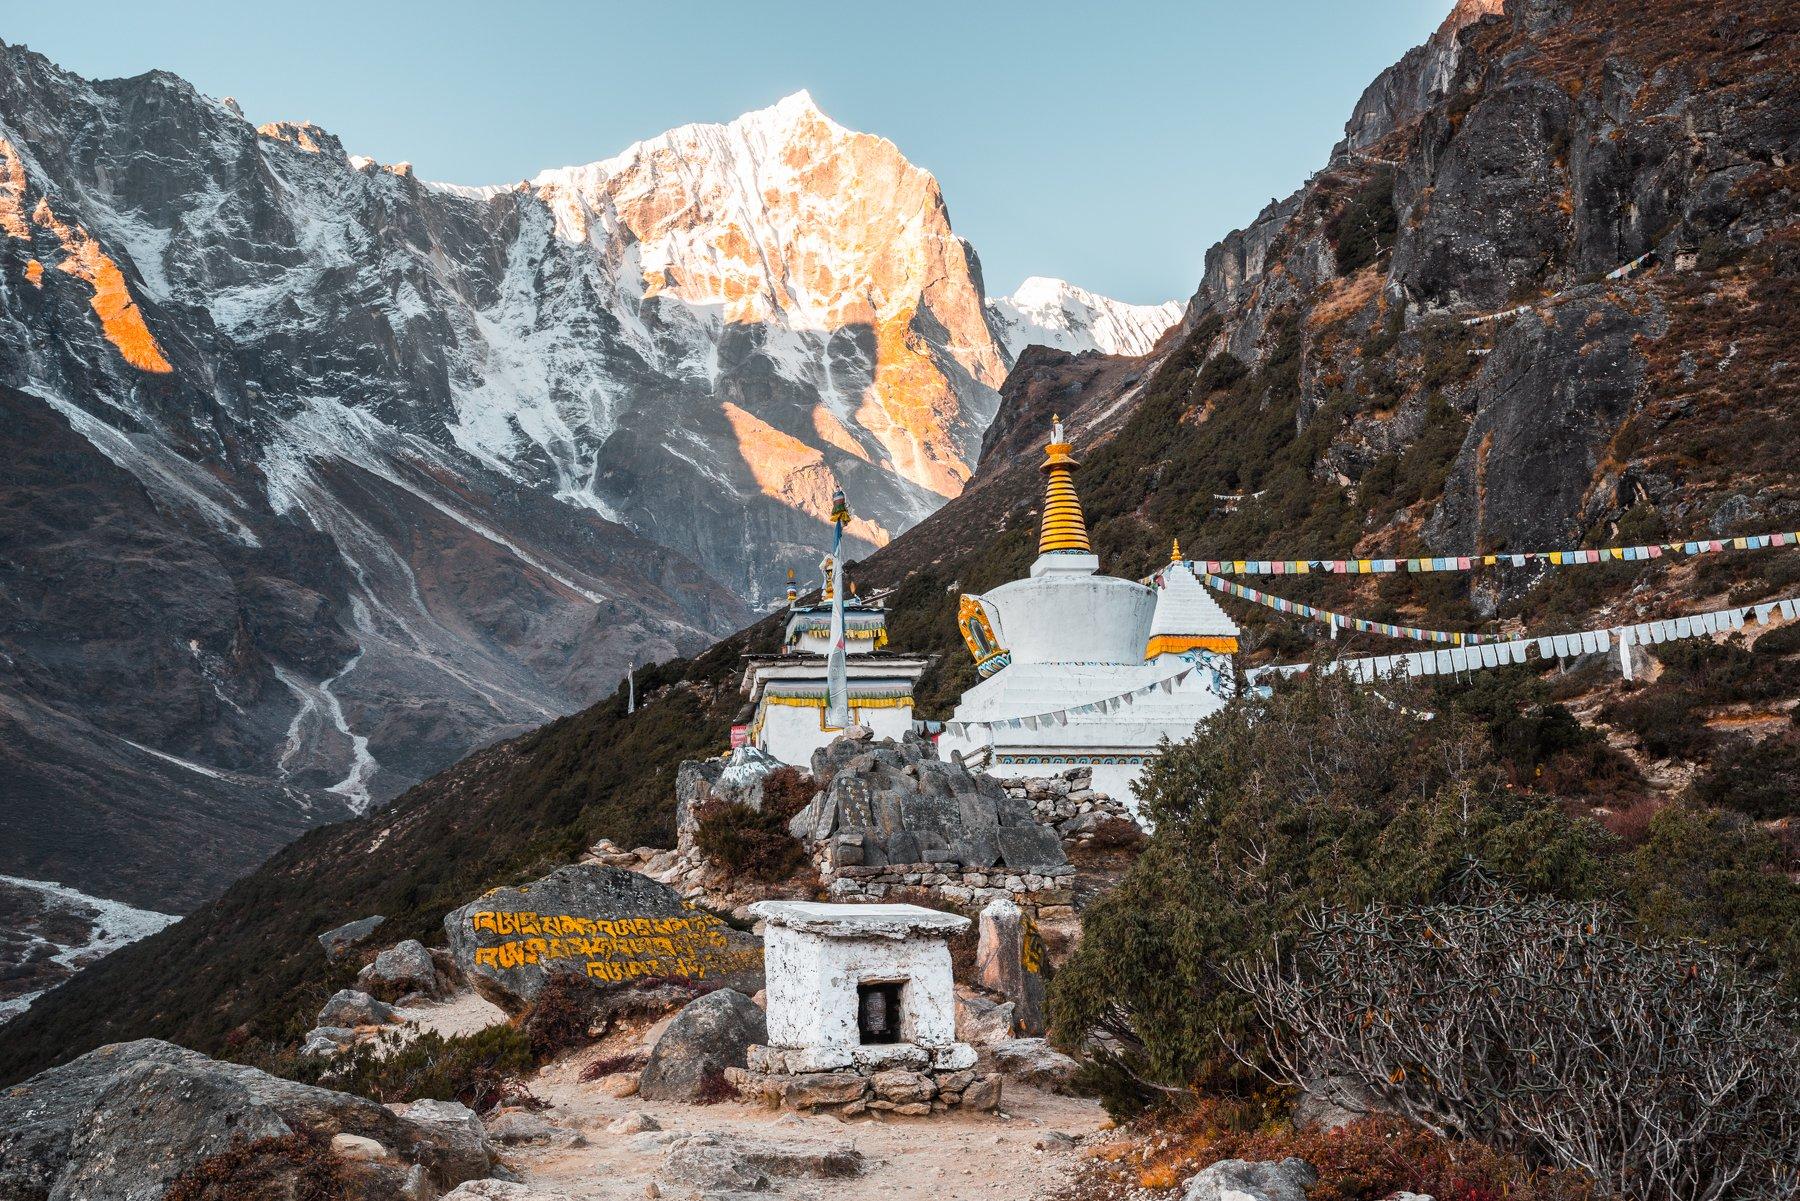 Гималаи, Непал, монастырь, ступа, горы, Evgeniy Khilkevitch